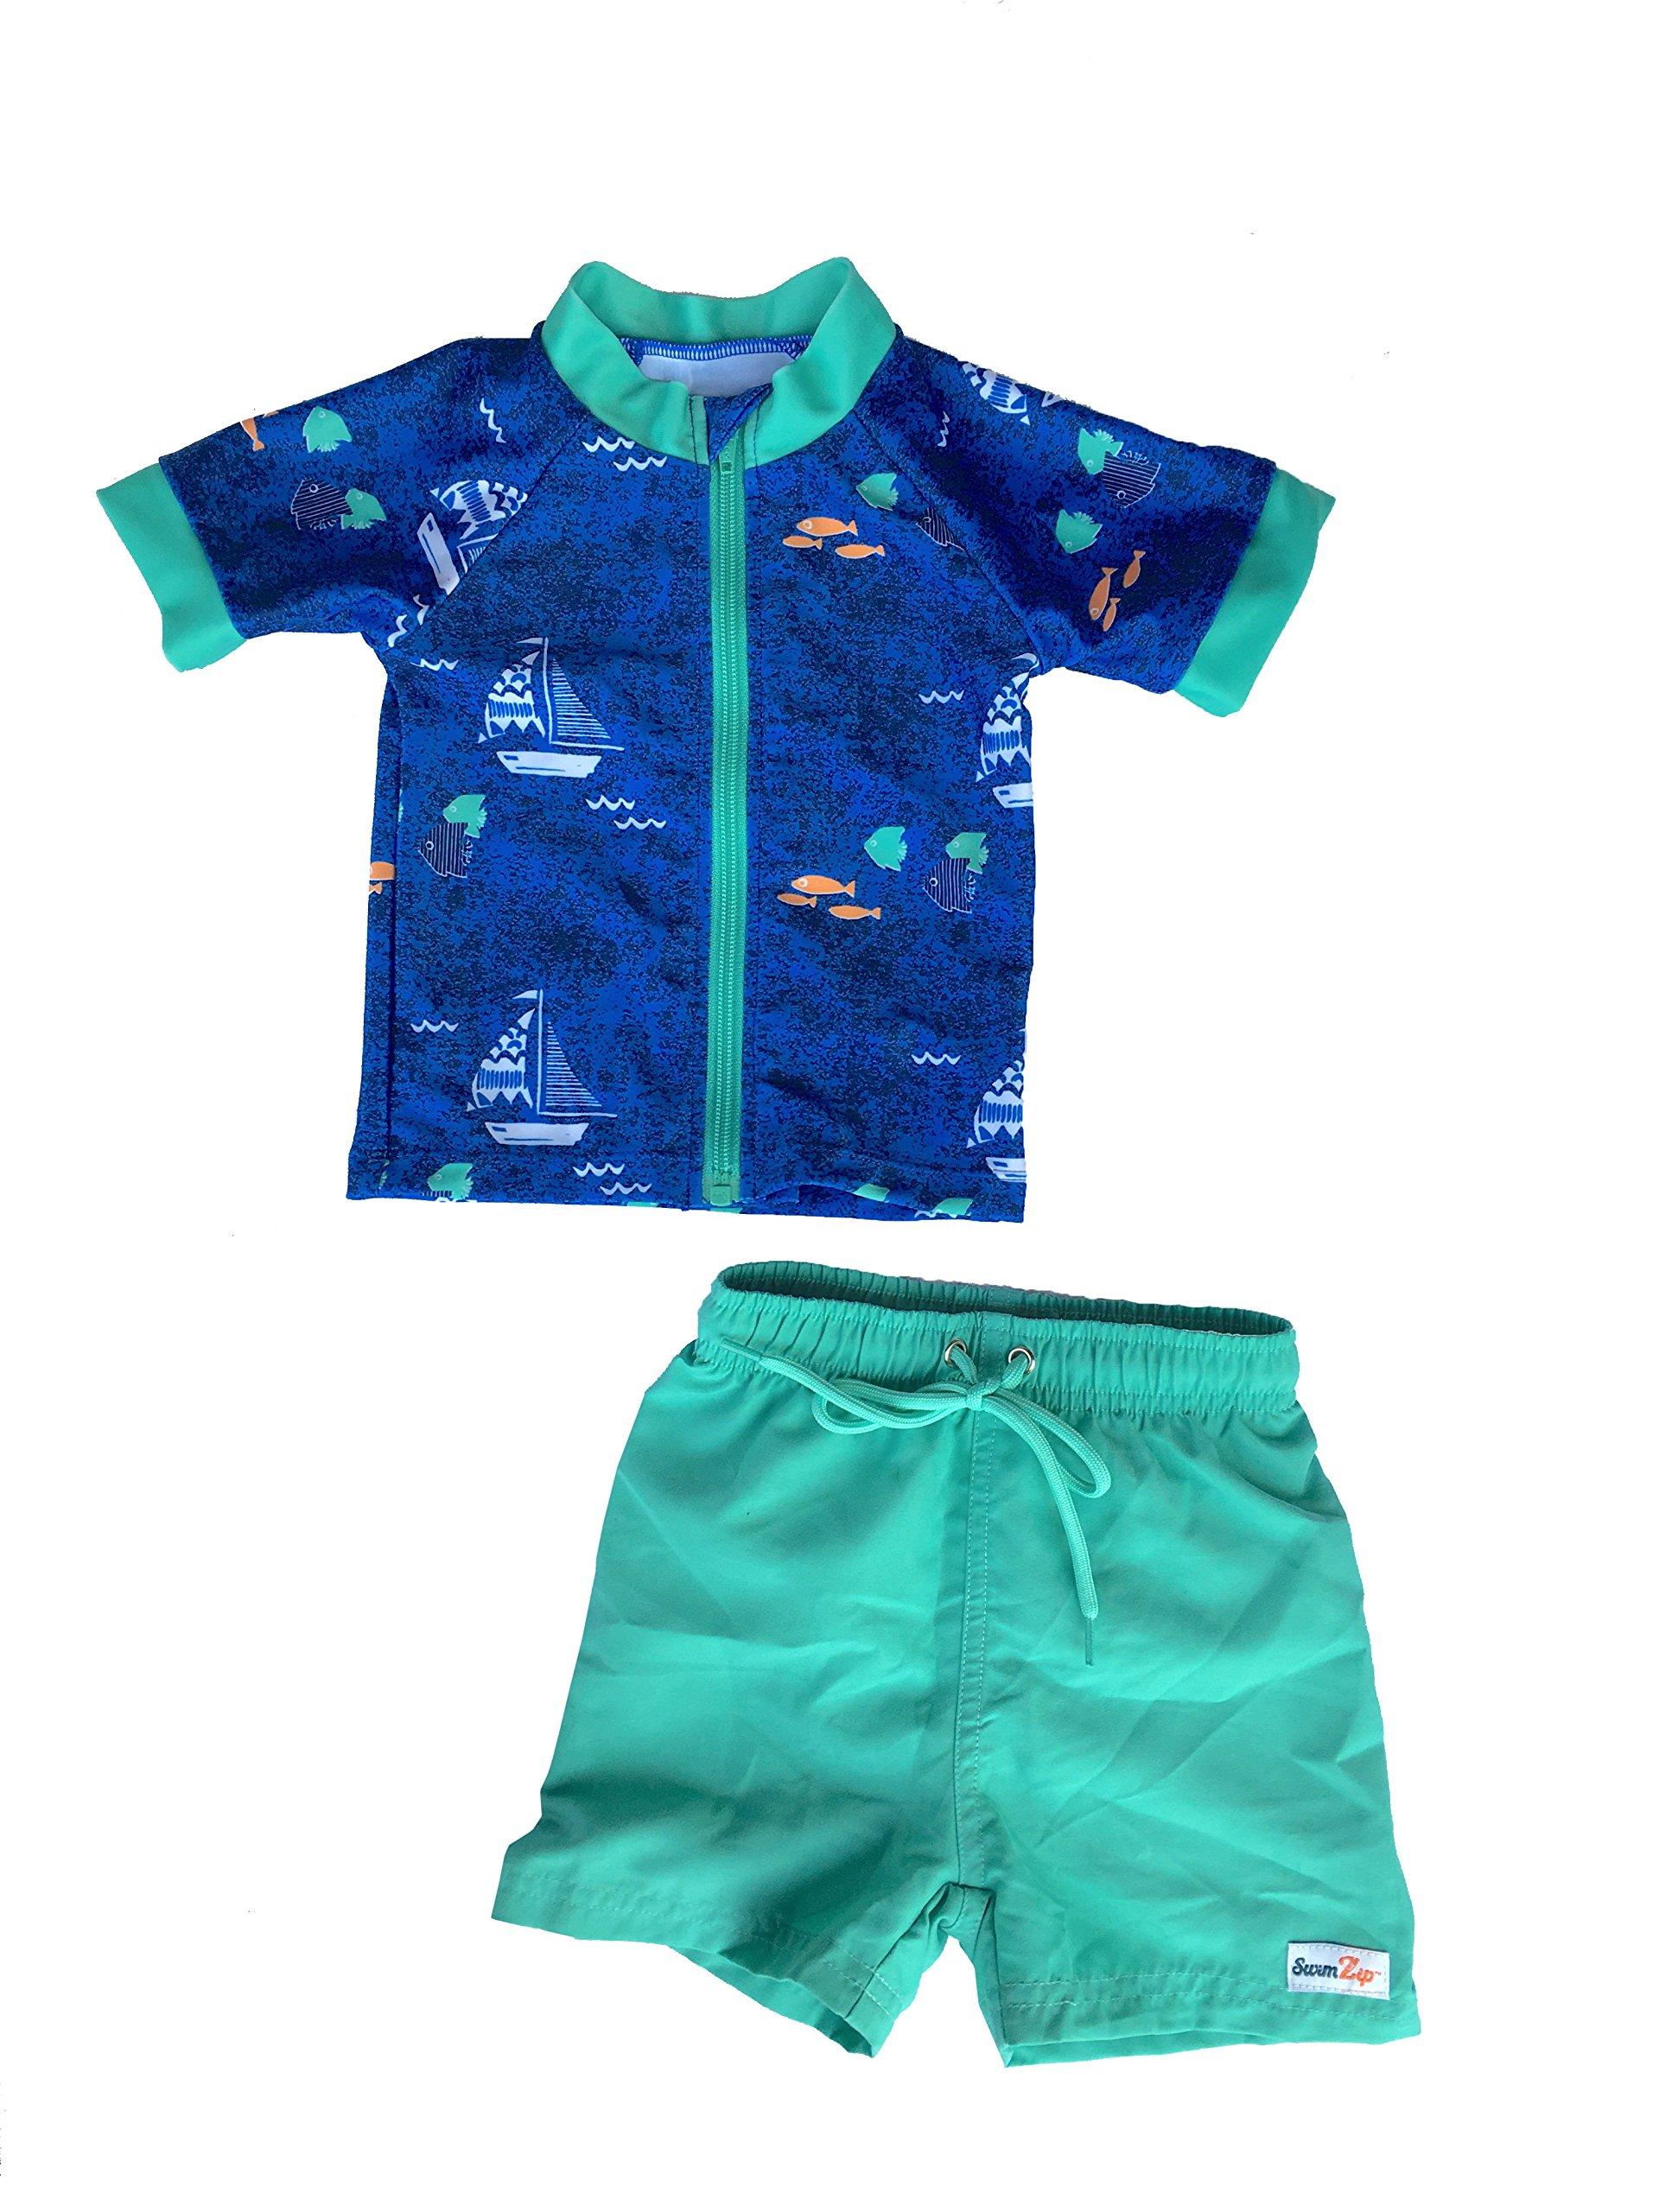 f12a48d70a Get Quotations · SwimZip Zipper Short Sleeve Rash Guard Swimsuit Set  Captain Kid Blue